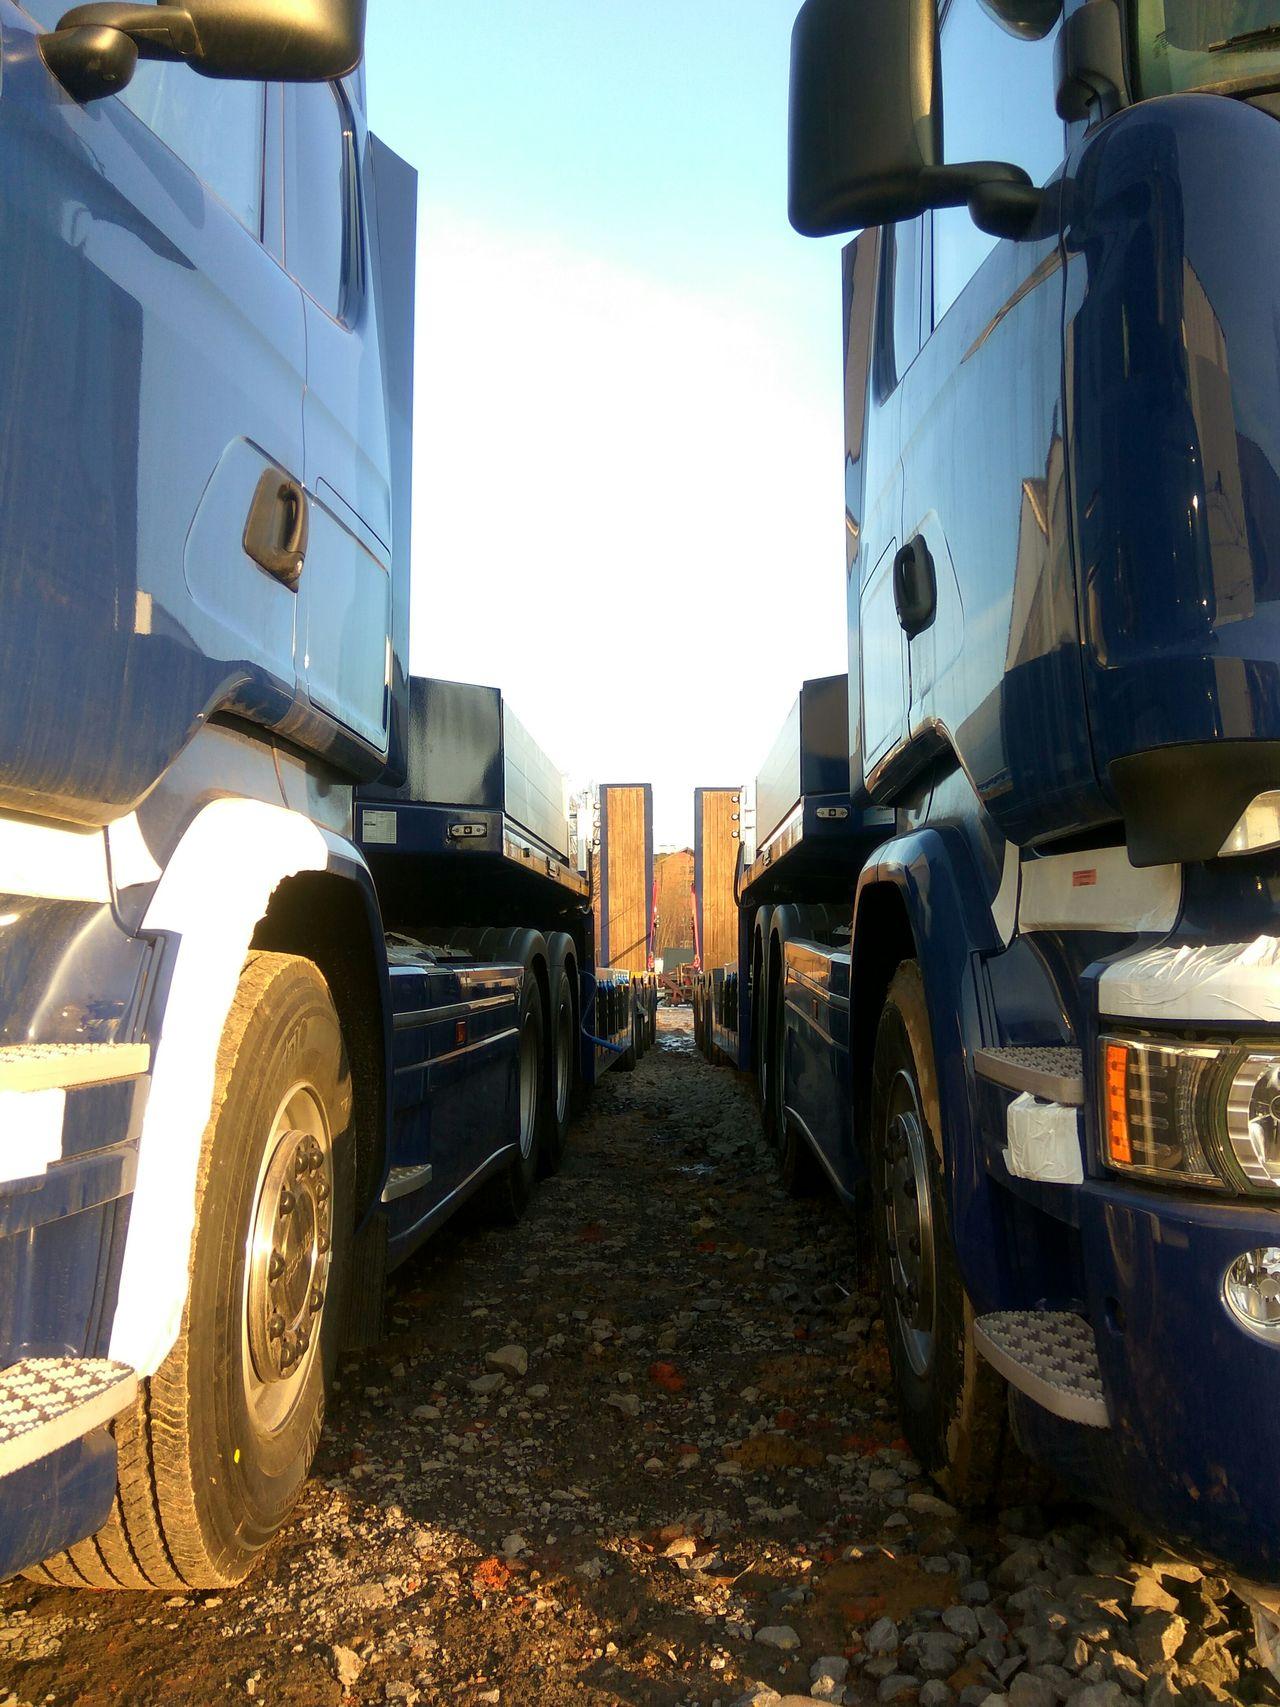 Transportation Sky Outdoors No People Day Trucks Trailers Ramps Vehicle Haulage Semi-truck Semi Trailer